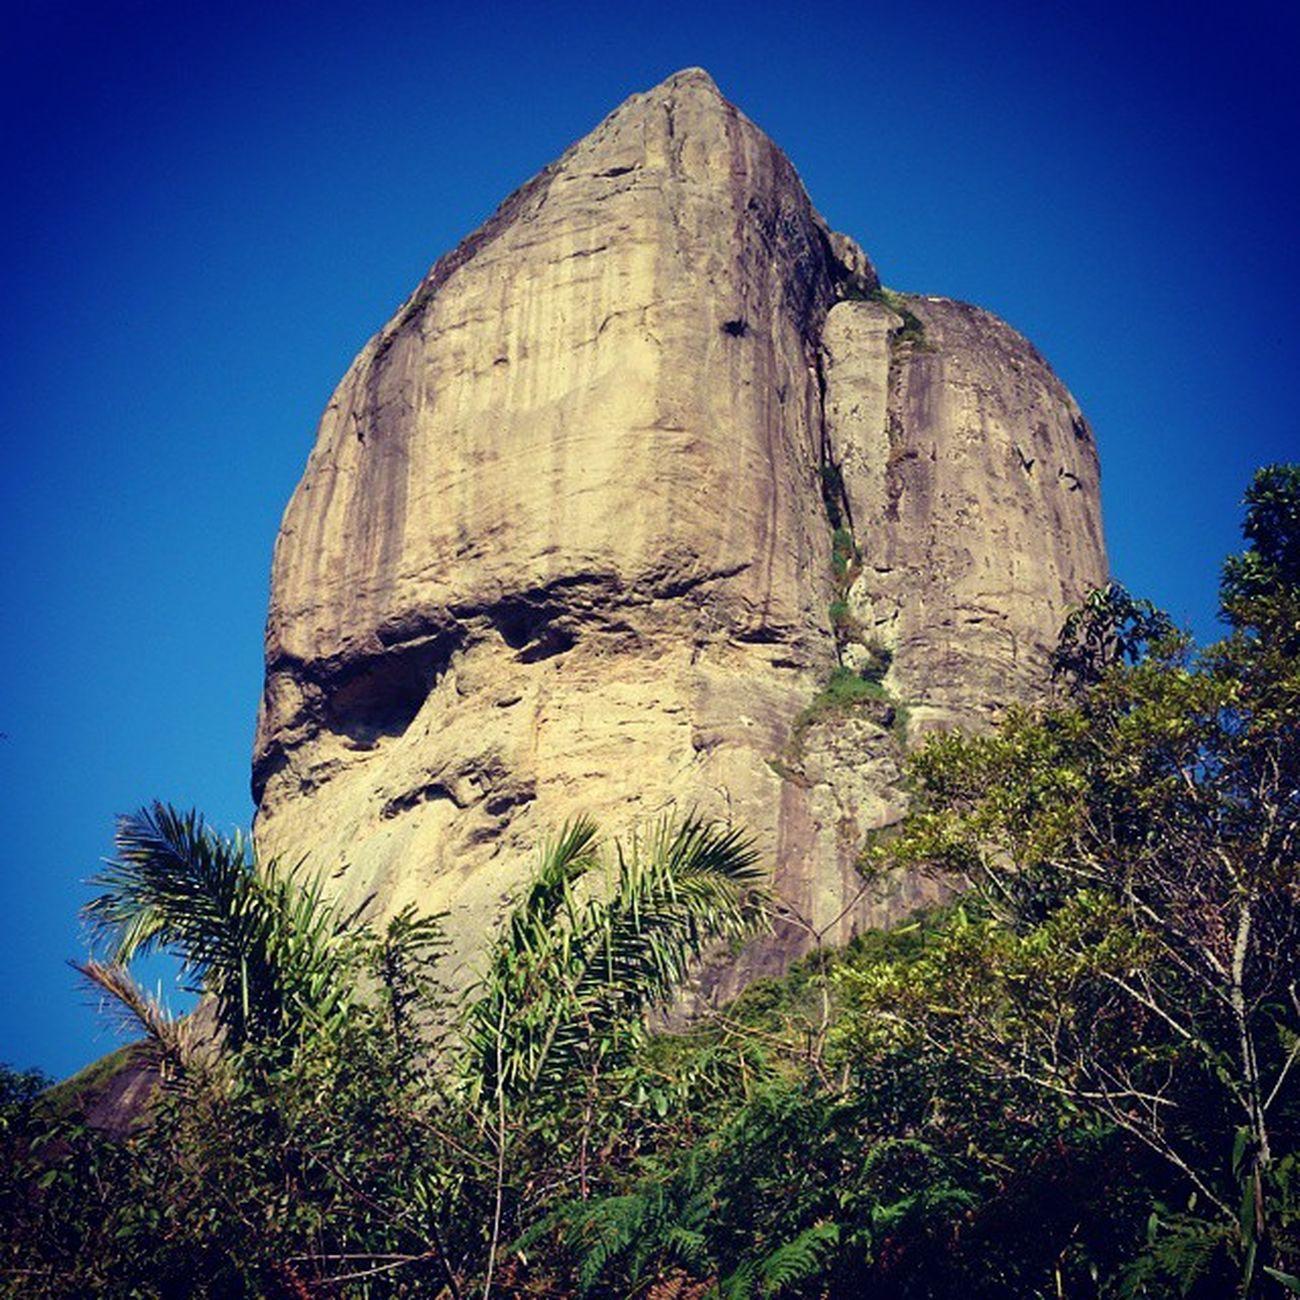 Pedradagavea Fenícios Phoenician Esfinge Sphinx Iwanttobelieve Riodejaneiro Brasil Brazil Xperiaz2